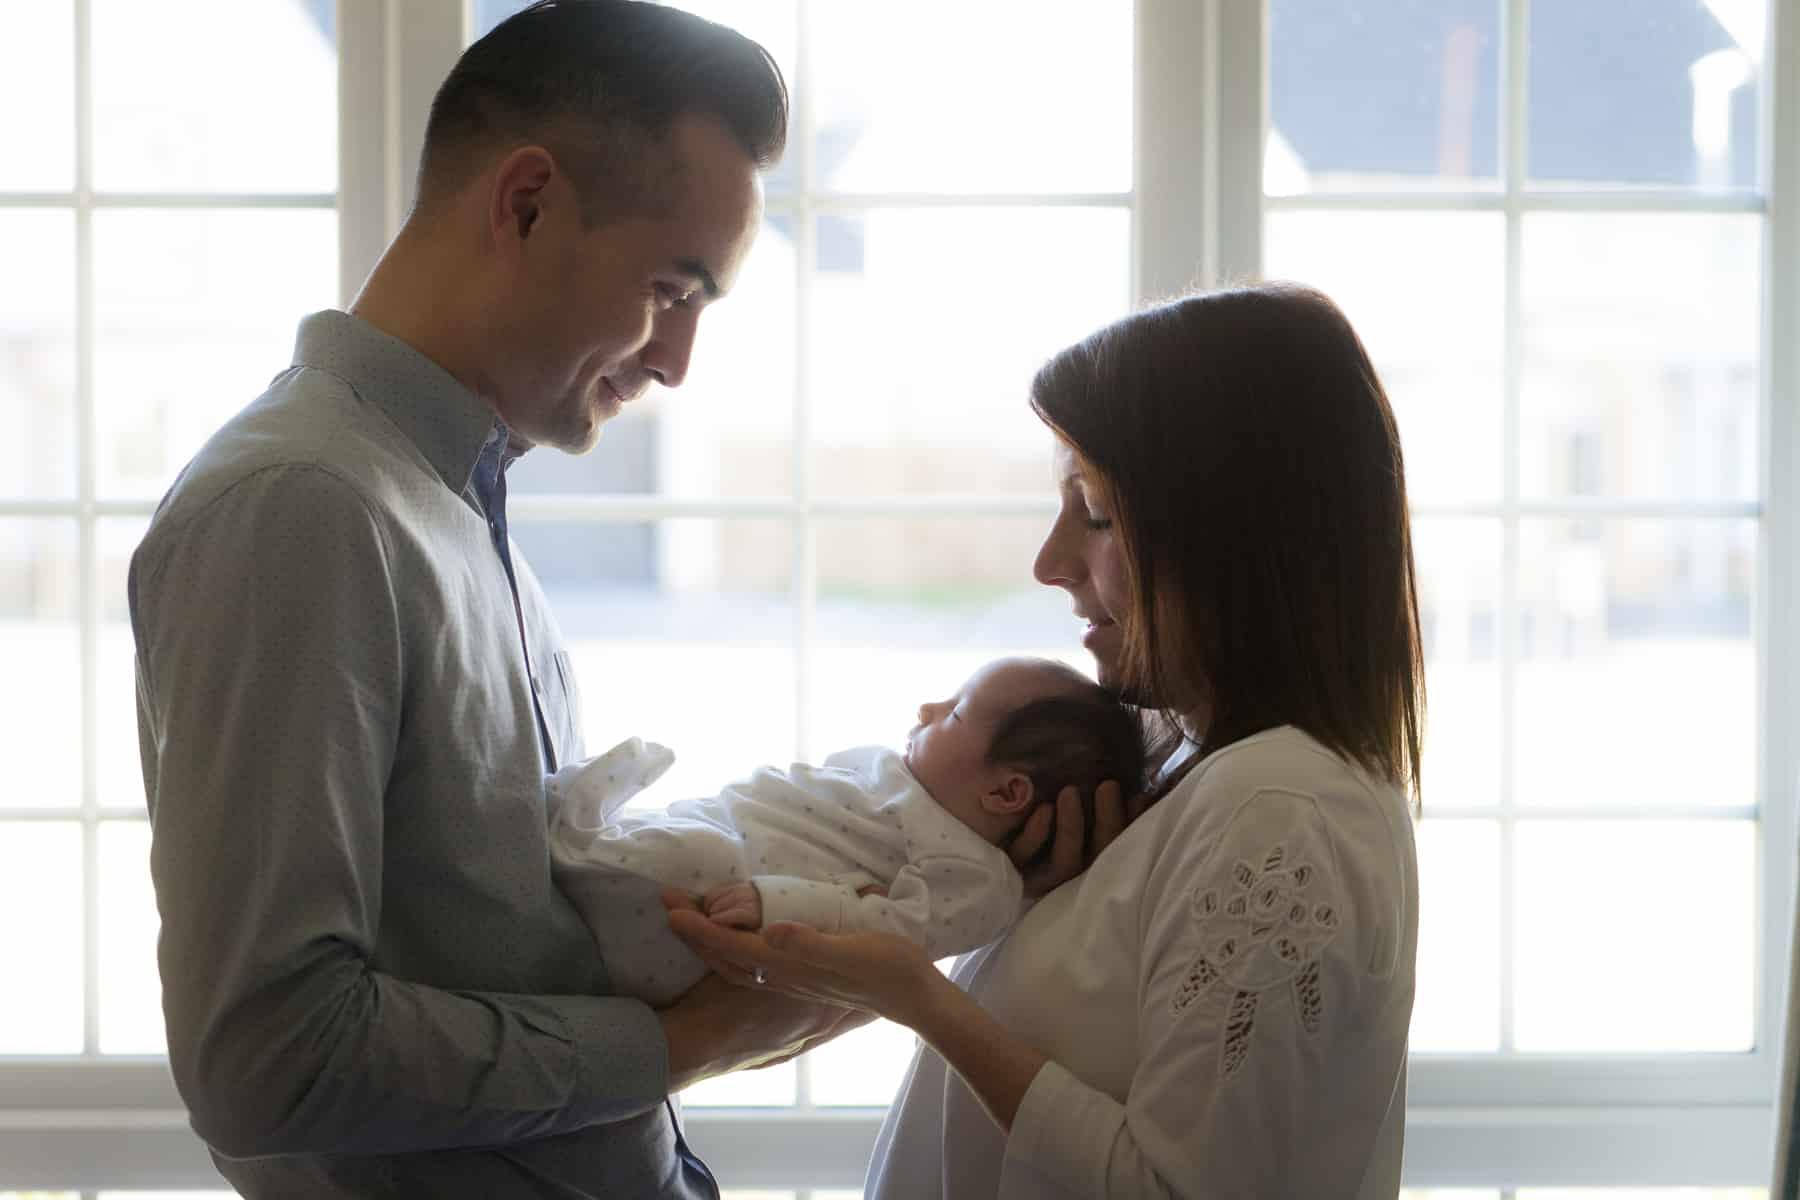 Newborn Photoshoots at home. Edinburgh and surrounding areas. 1